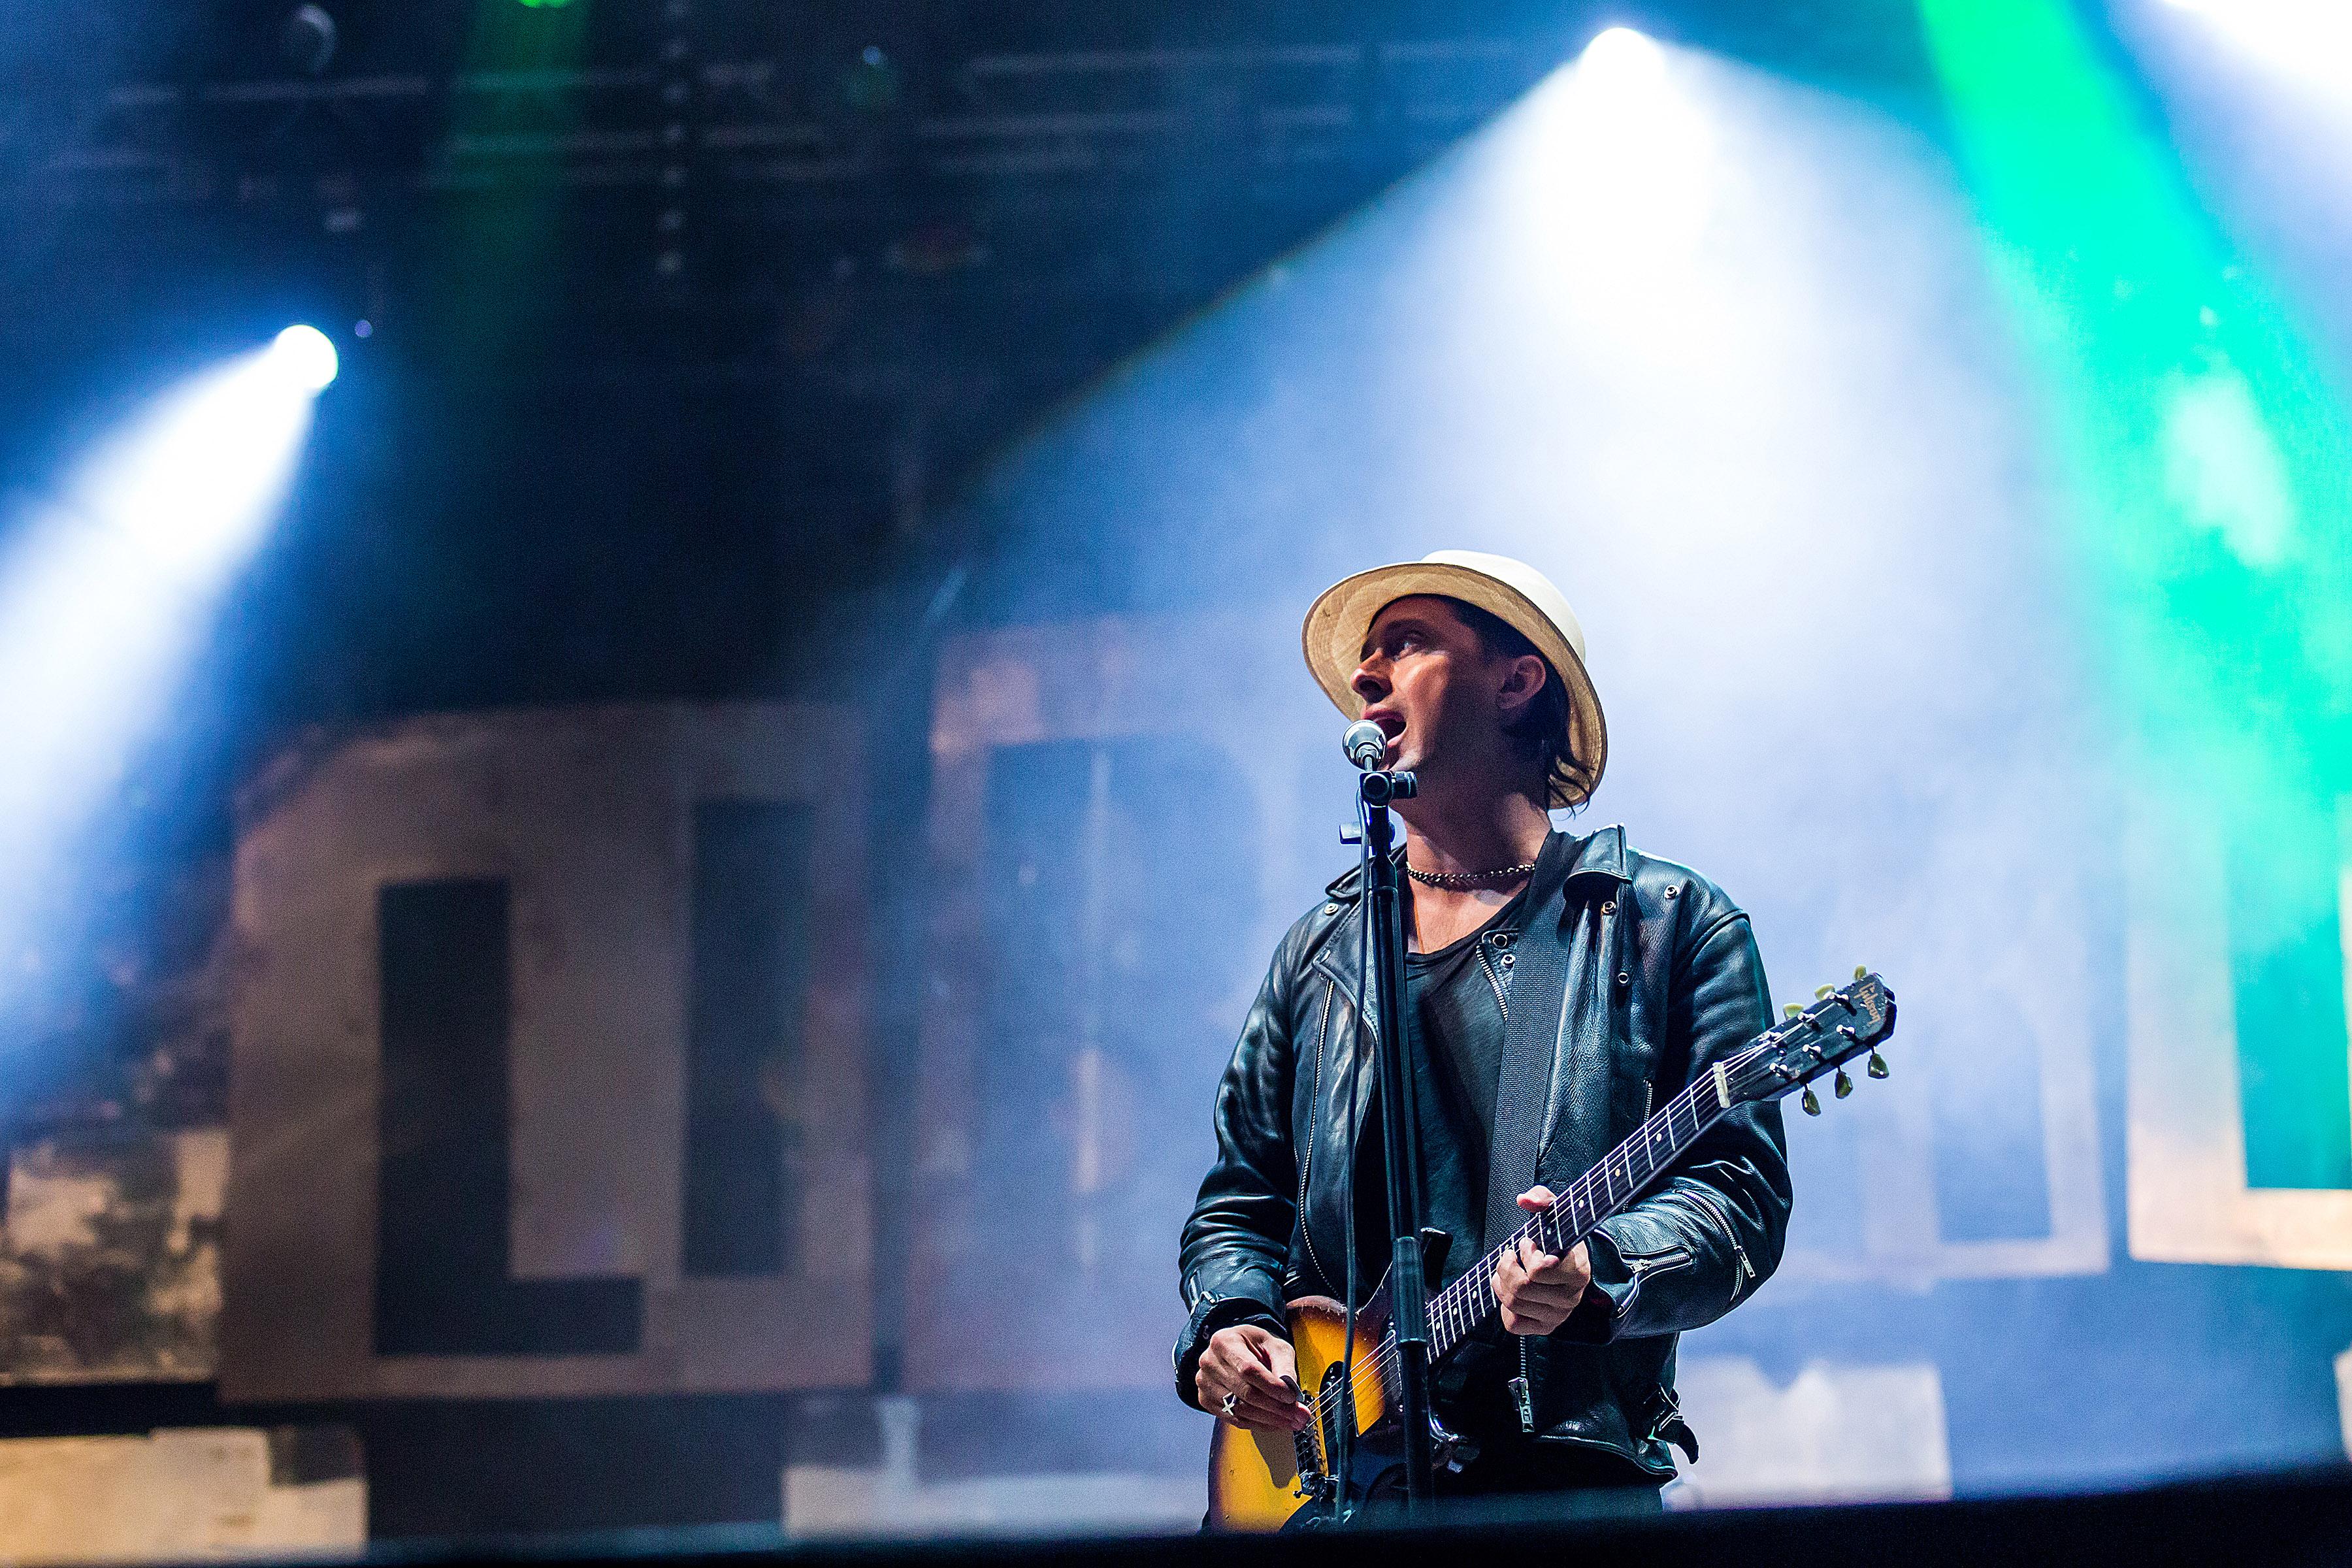 The Libertines headlining Saturday at Truck Festival 2017